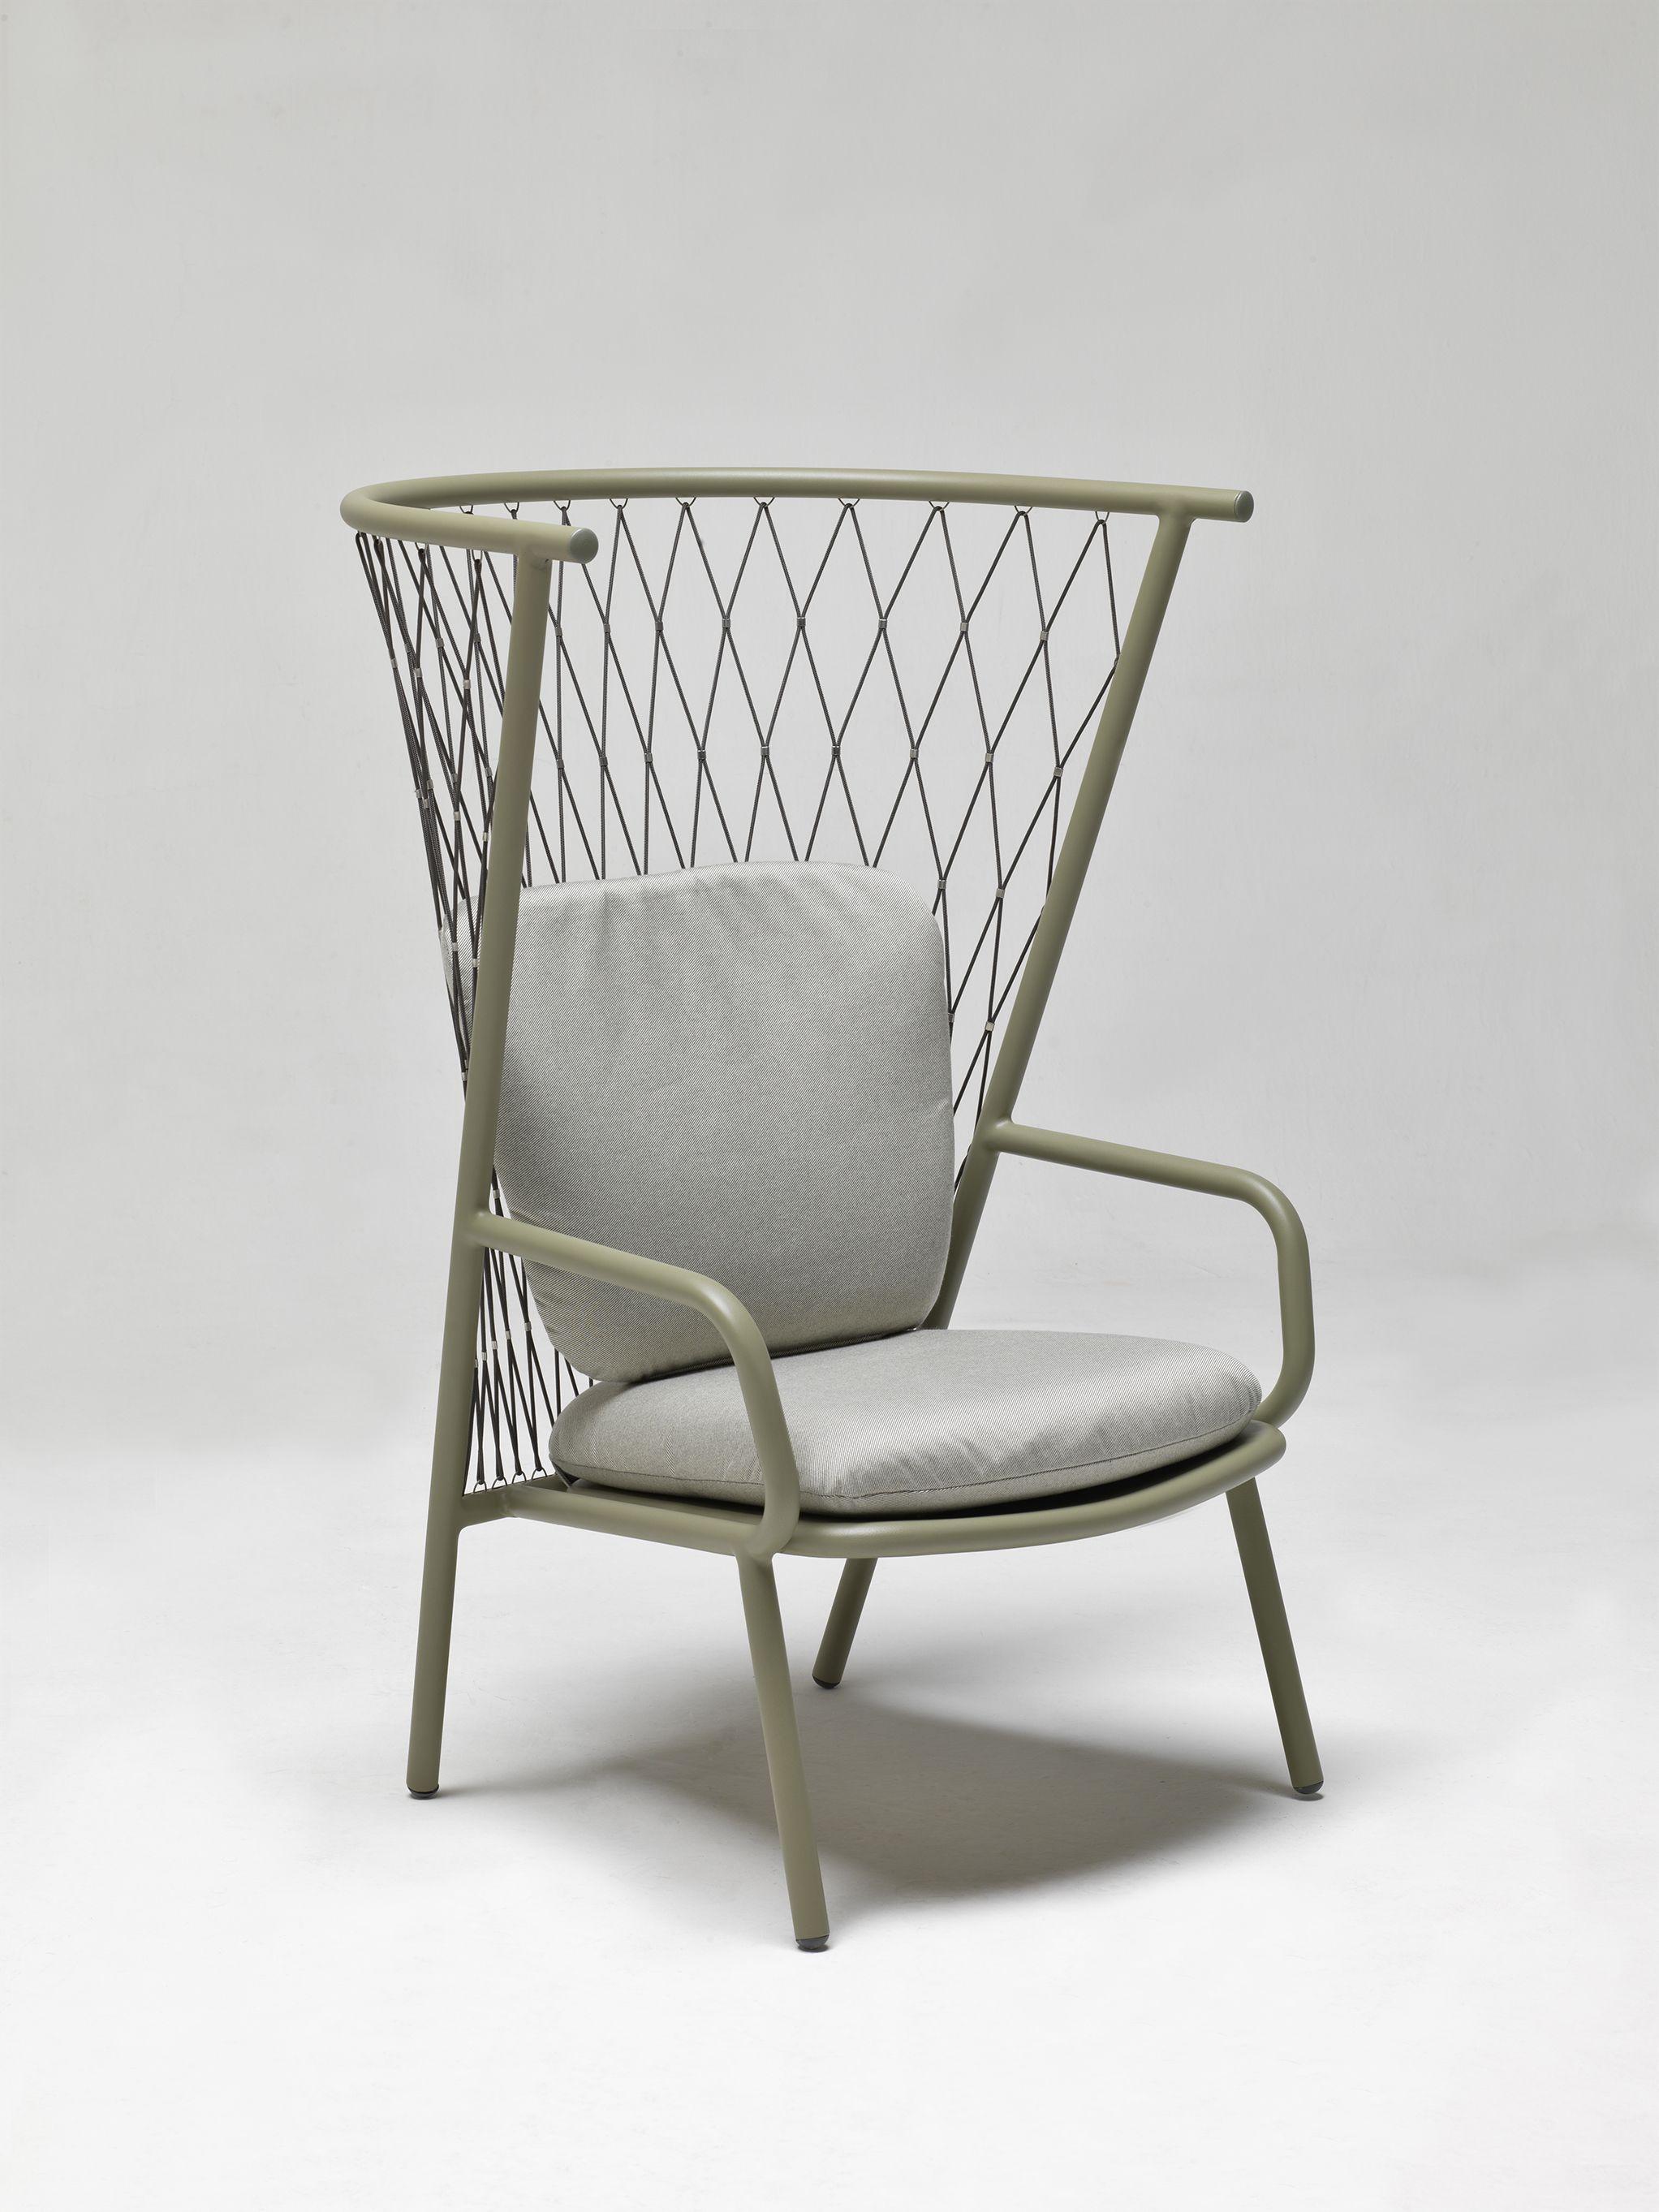 Nef Lounge Chair Designer: Patrick Norguet #emu #emuamericas #nefcollection  #patricknorguet #outdoorliving